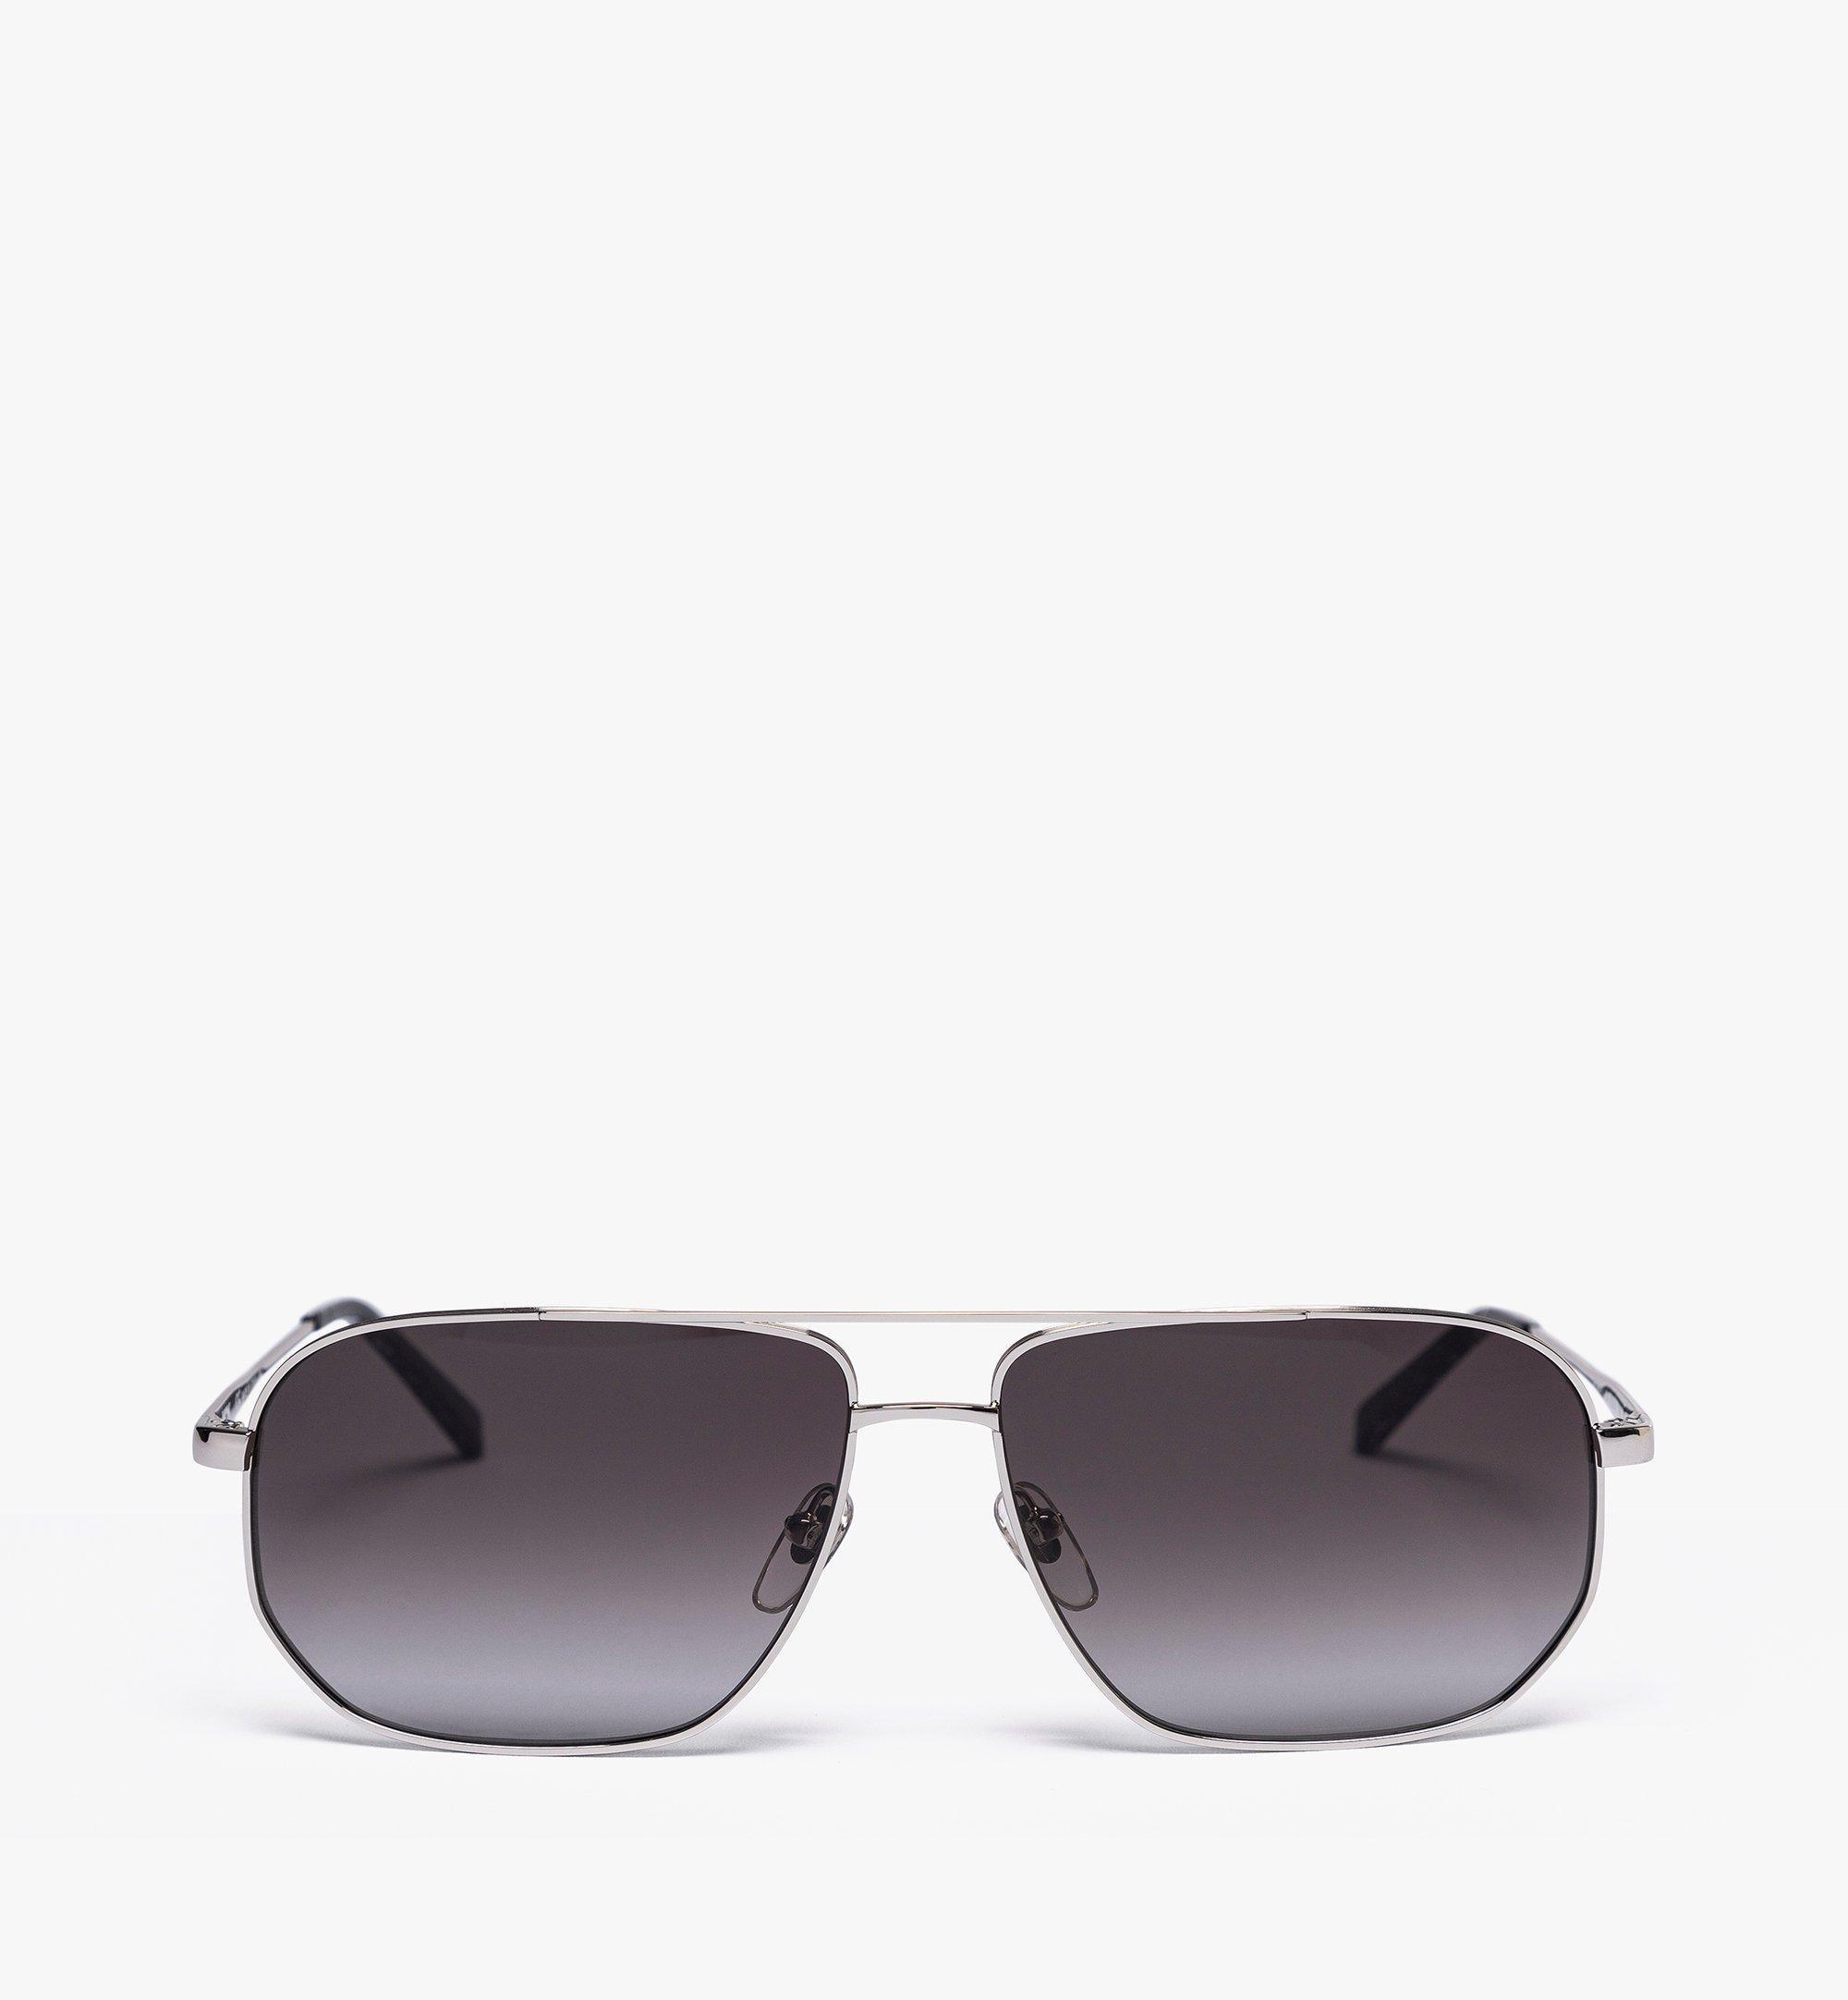 MCM 141S Aviator Sunglasses Grey MEGASMM09ED001 Alternate View 1